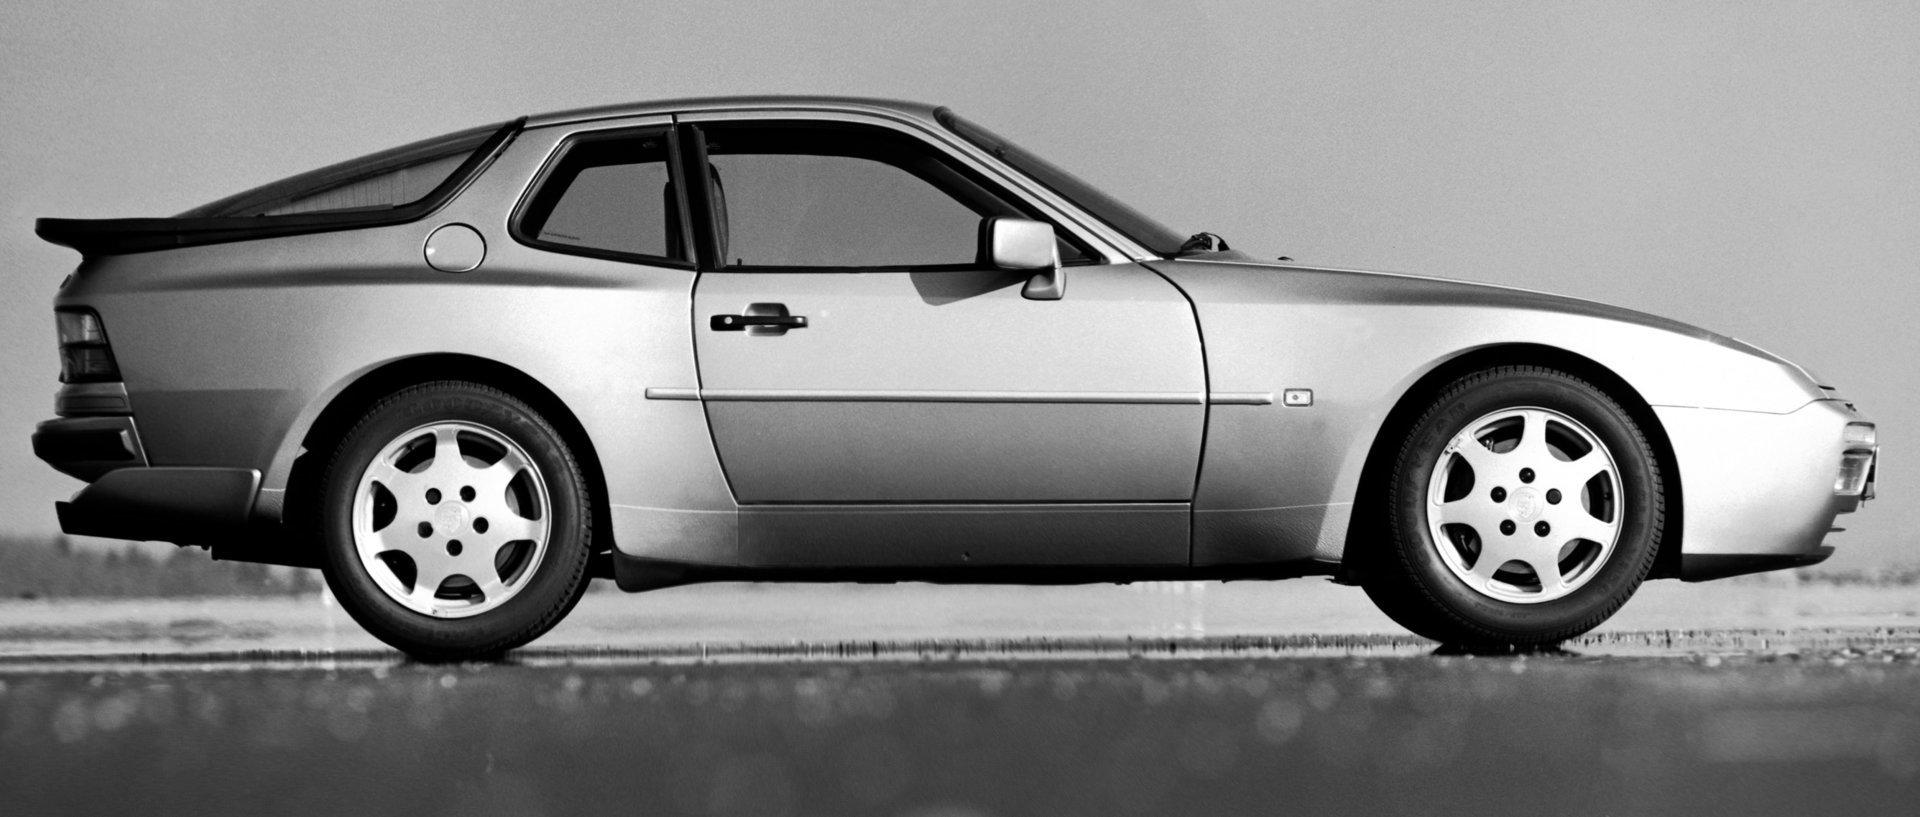 Coche del día: Porsche 944 Turbo S